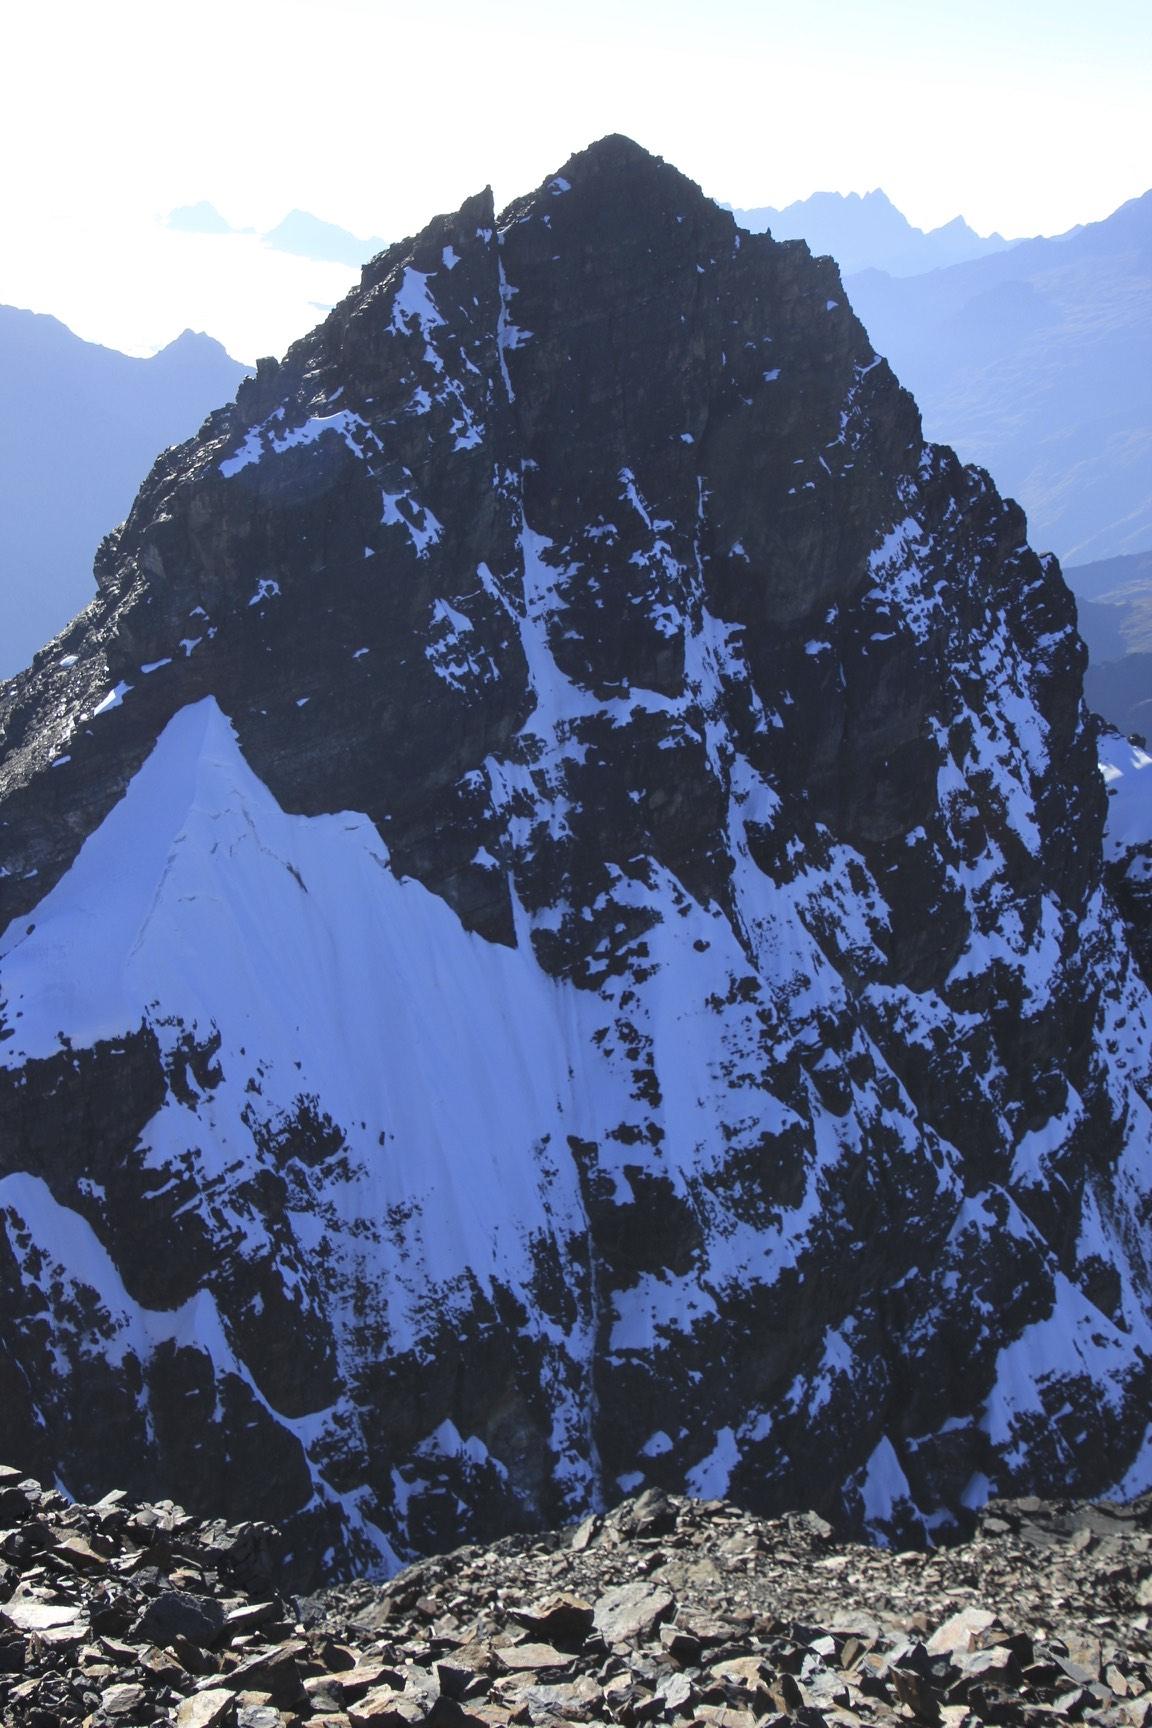 Innominado 5,320m seen from the summit of Pequeno Alpamayo.